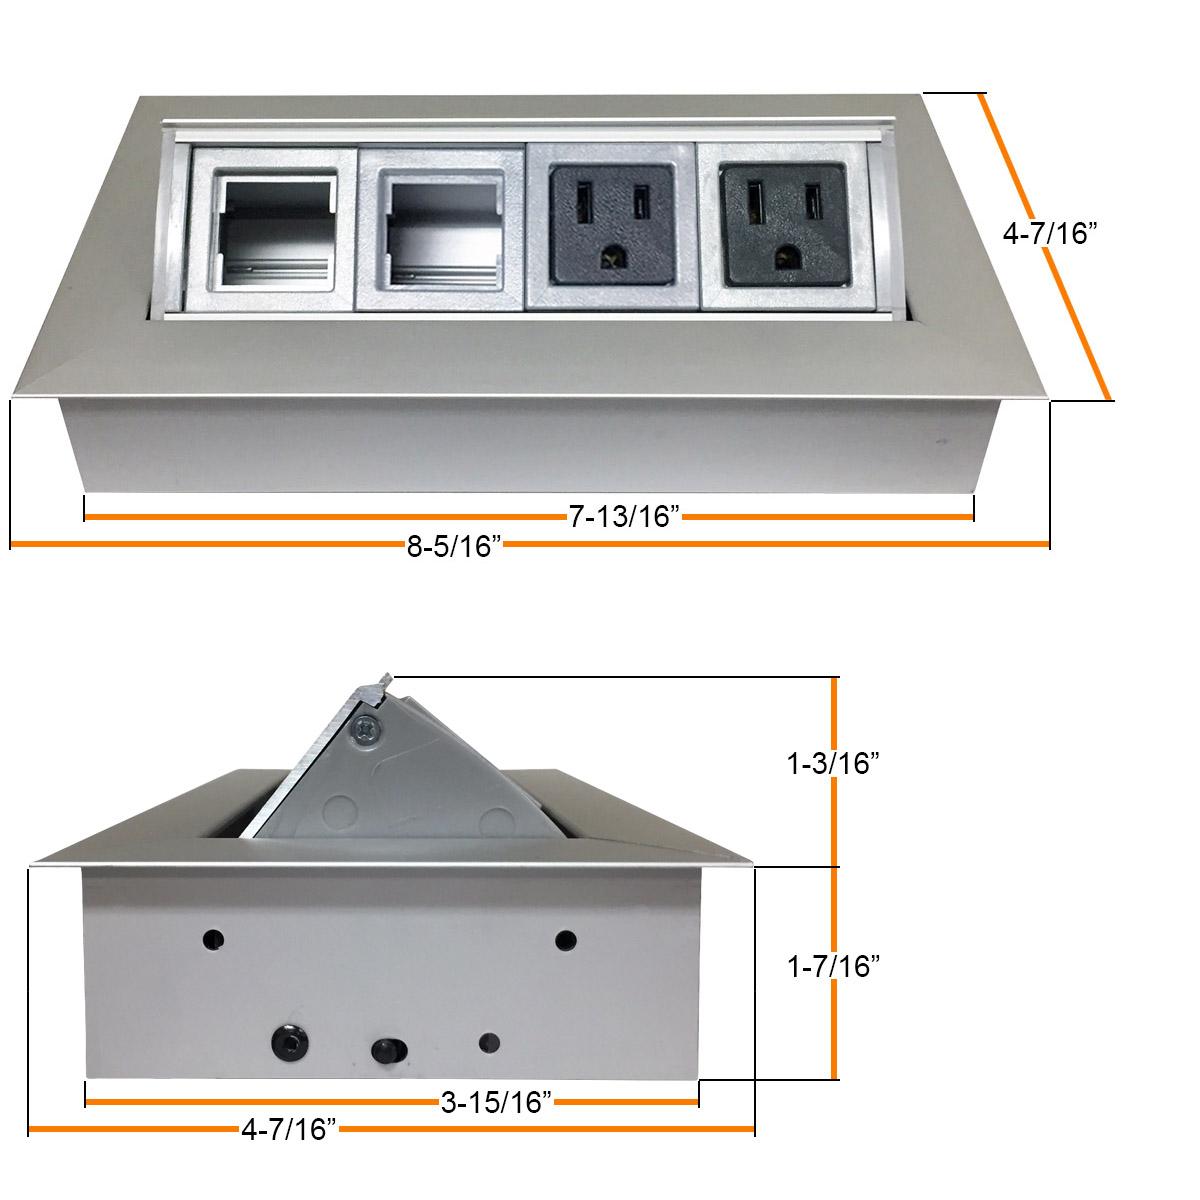 Aluminum Pop-Up Power/Data Distribution Center | Desk Outlets